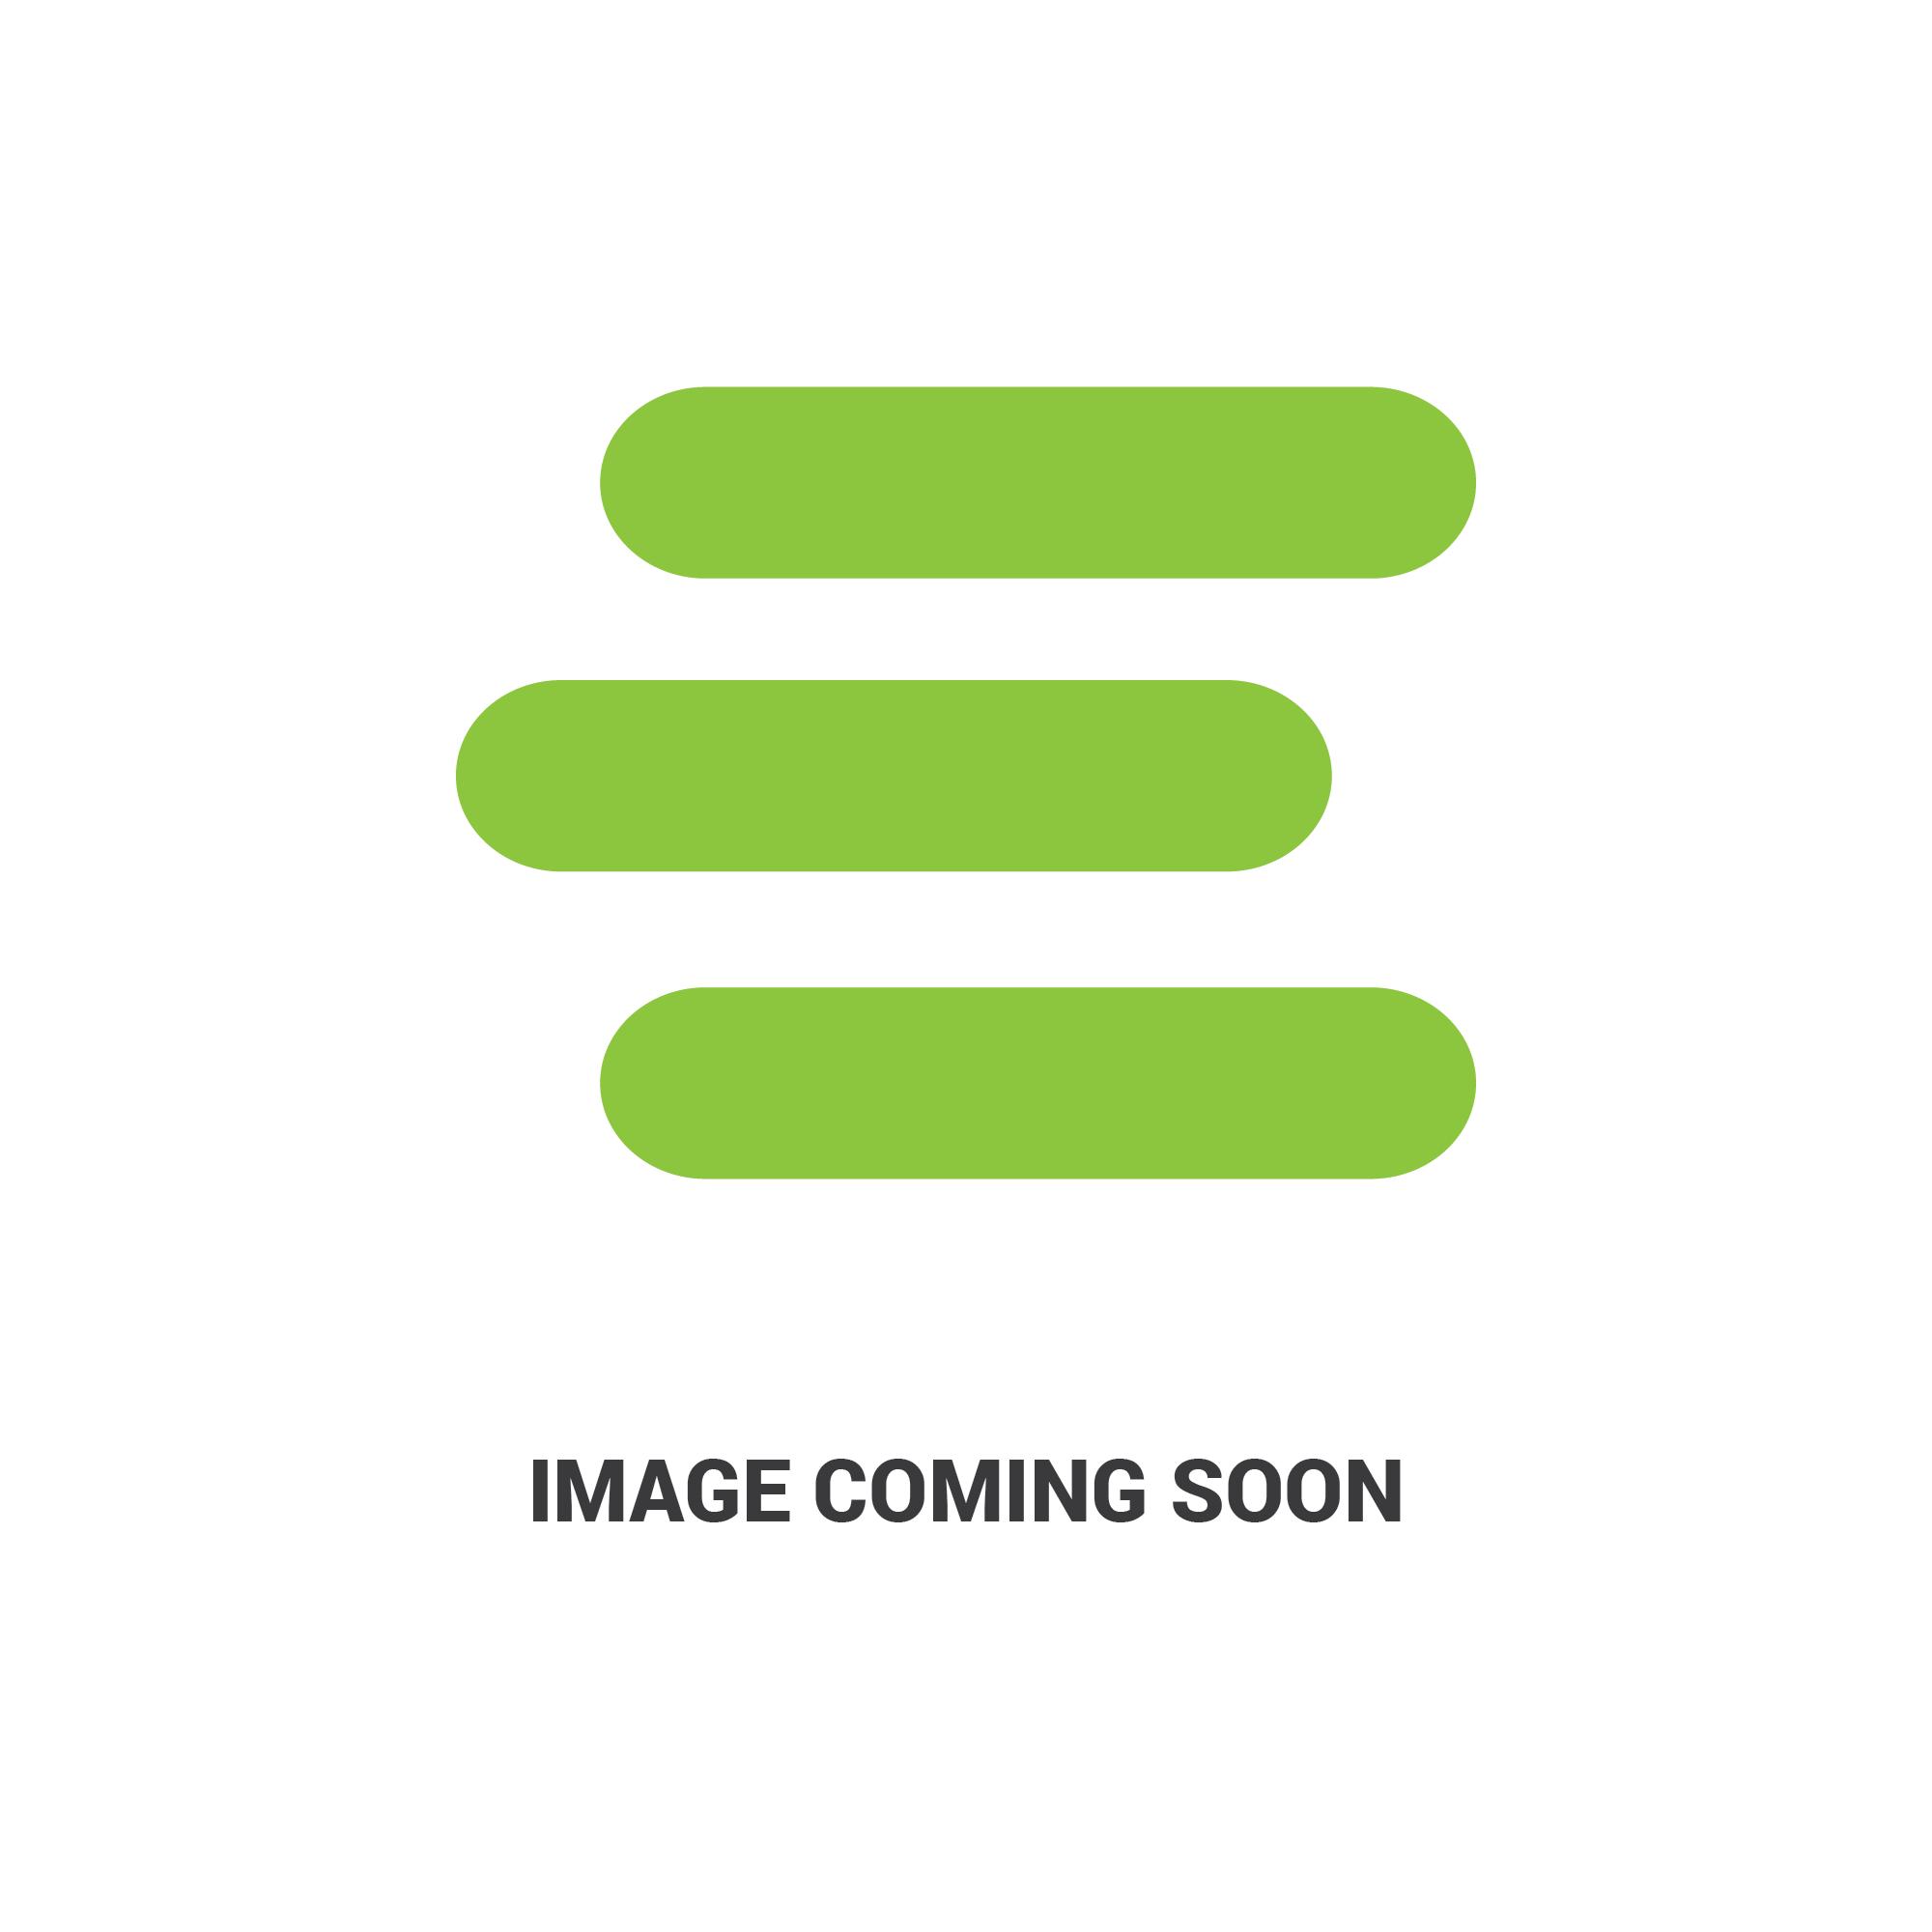 E-3J080-108722037_1.jpg